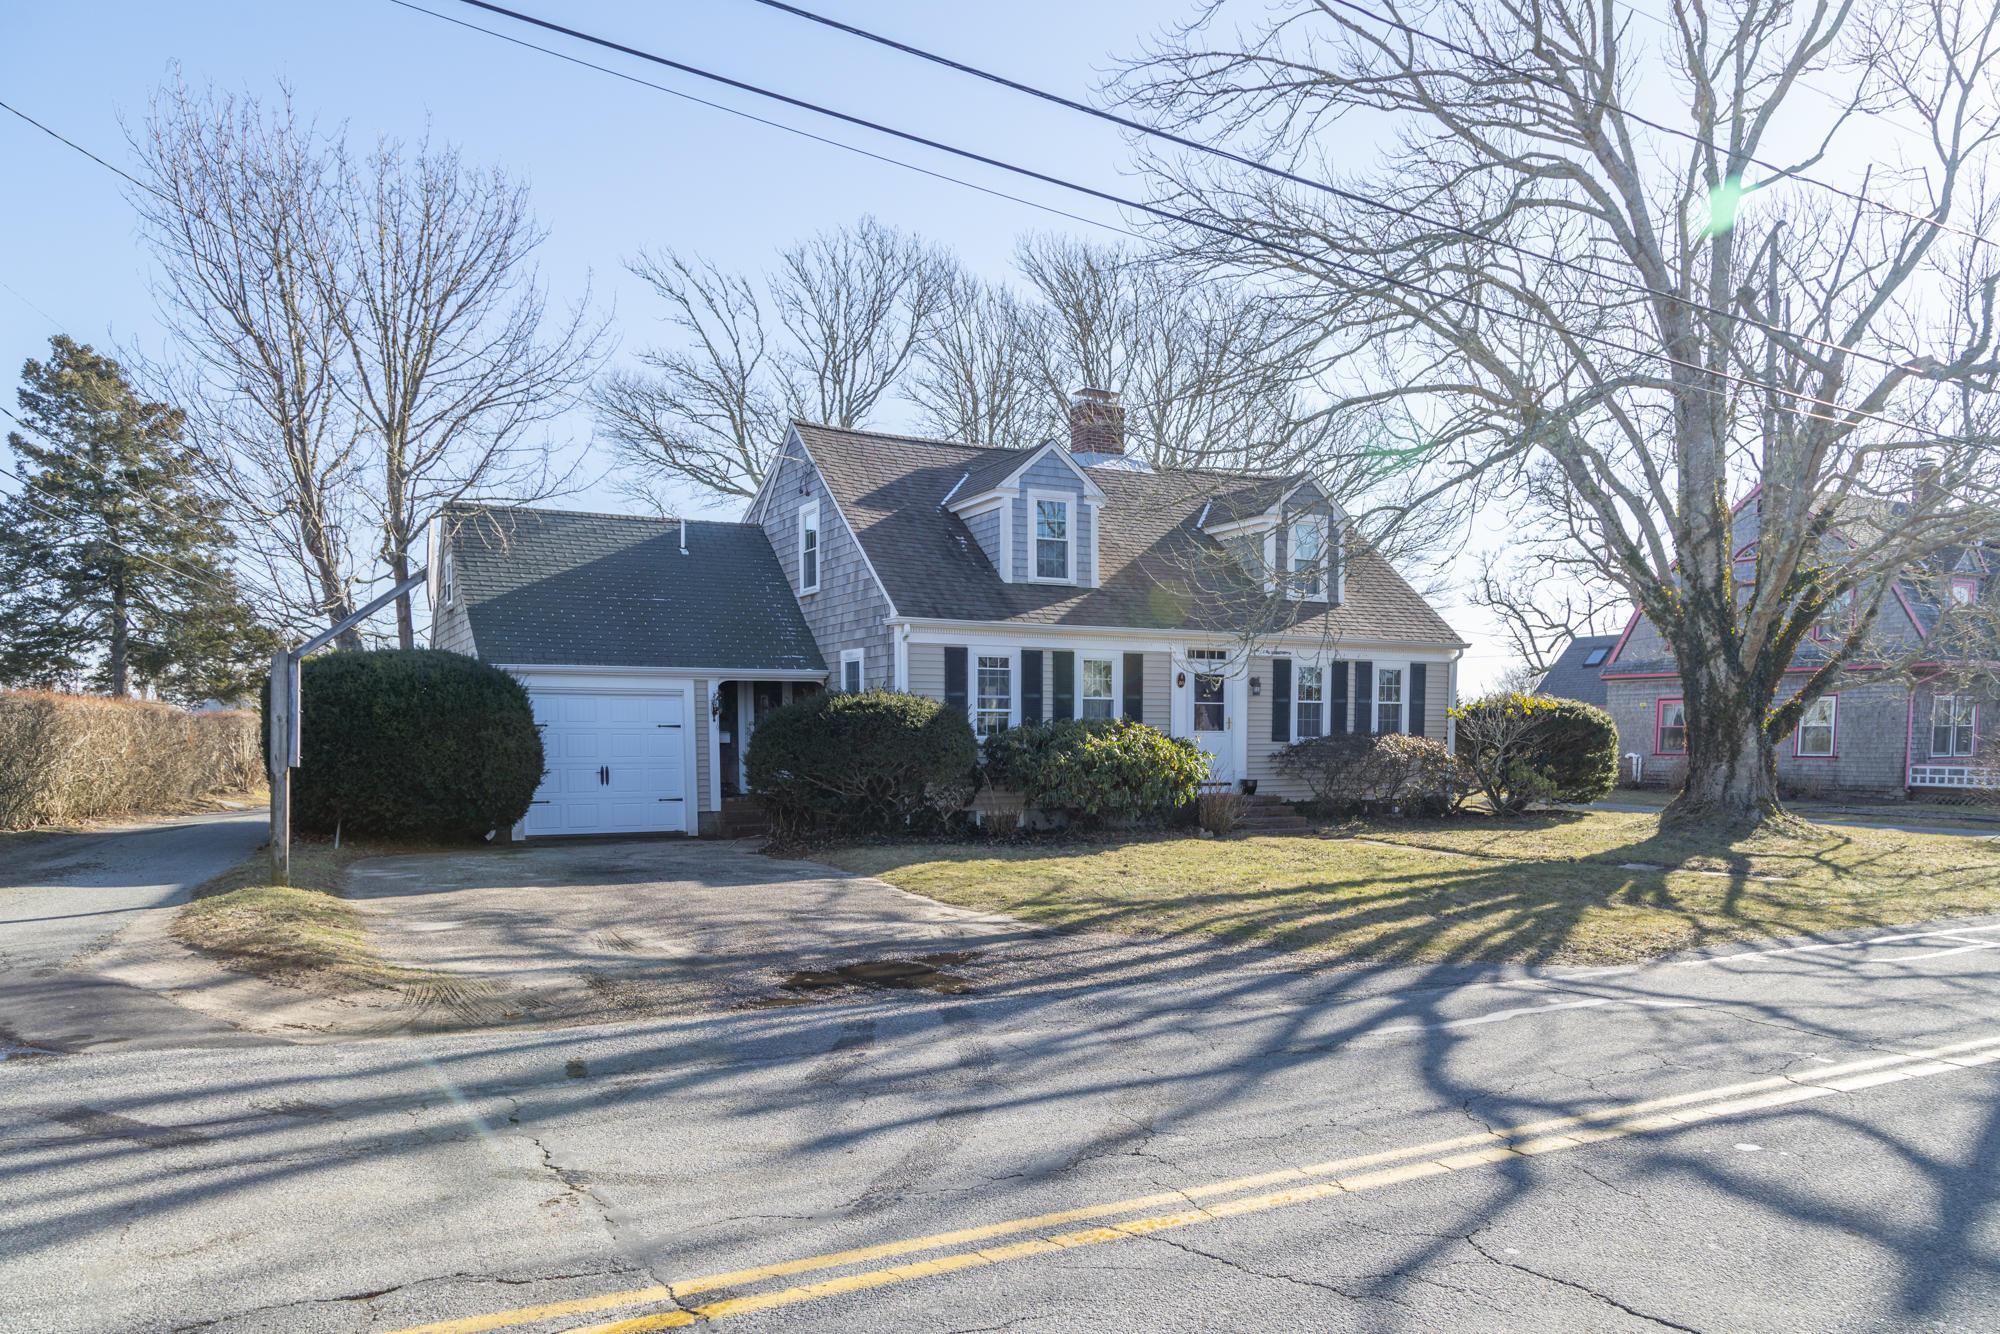 80 Seaview Street, Chatham MA, 02633 - slide 16